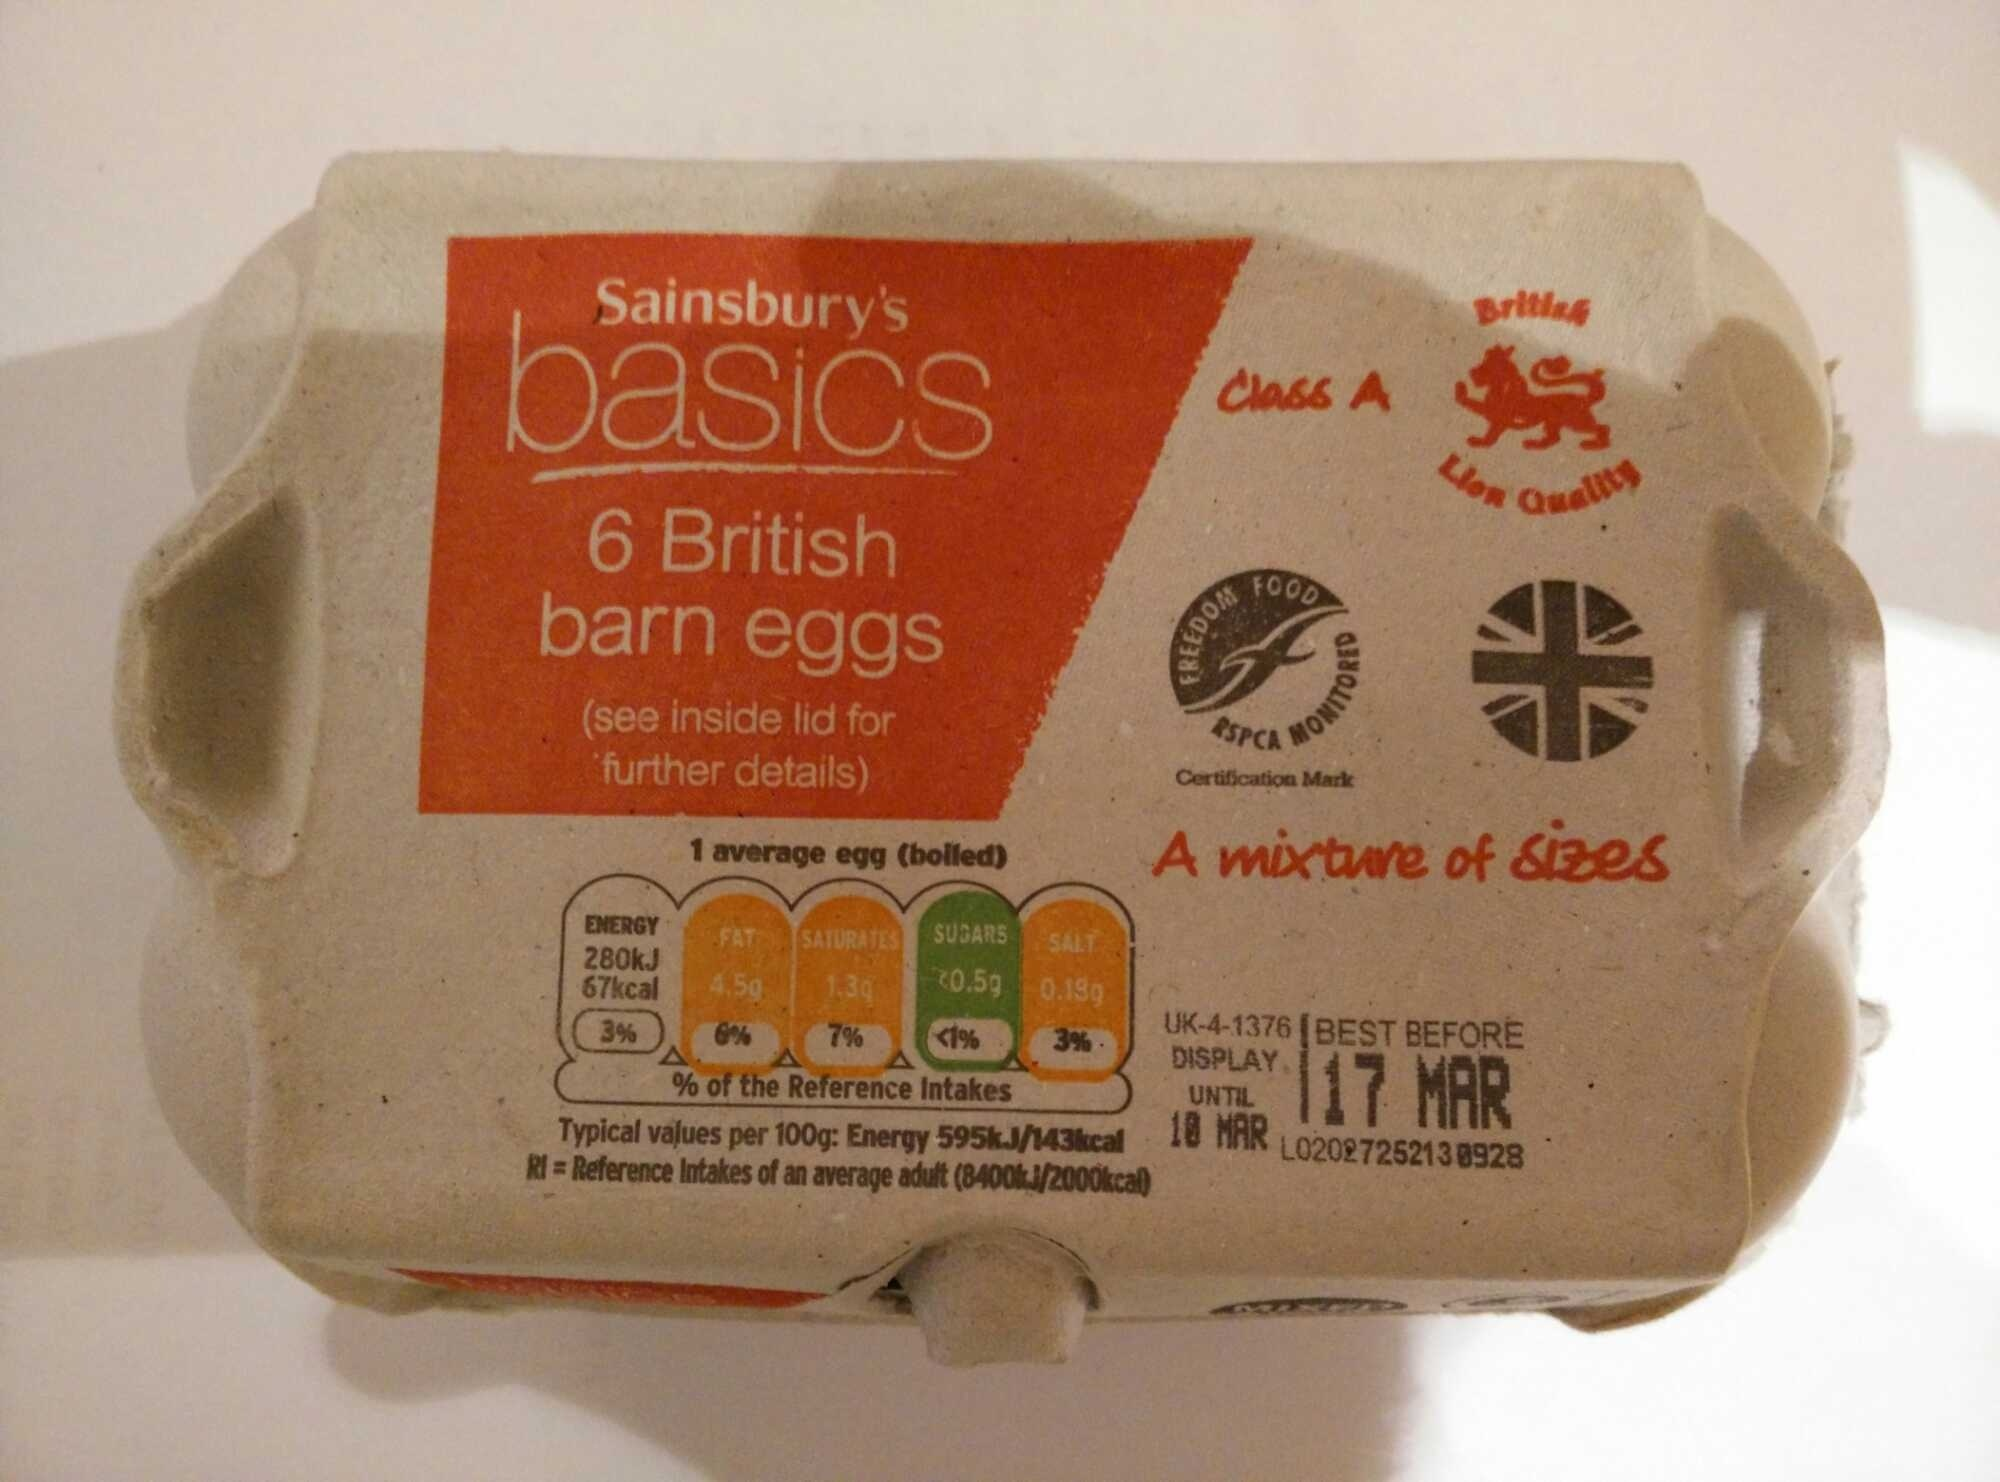 6 British barn eggs - Produit - en